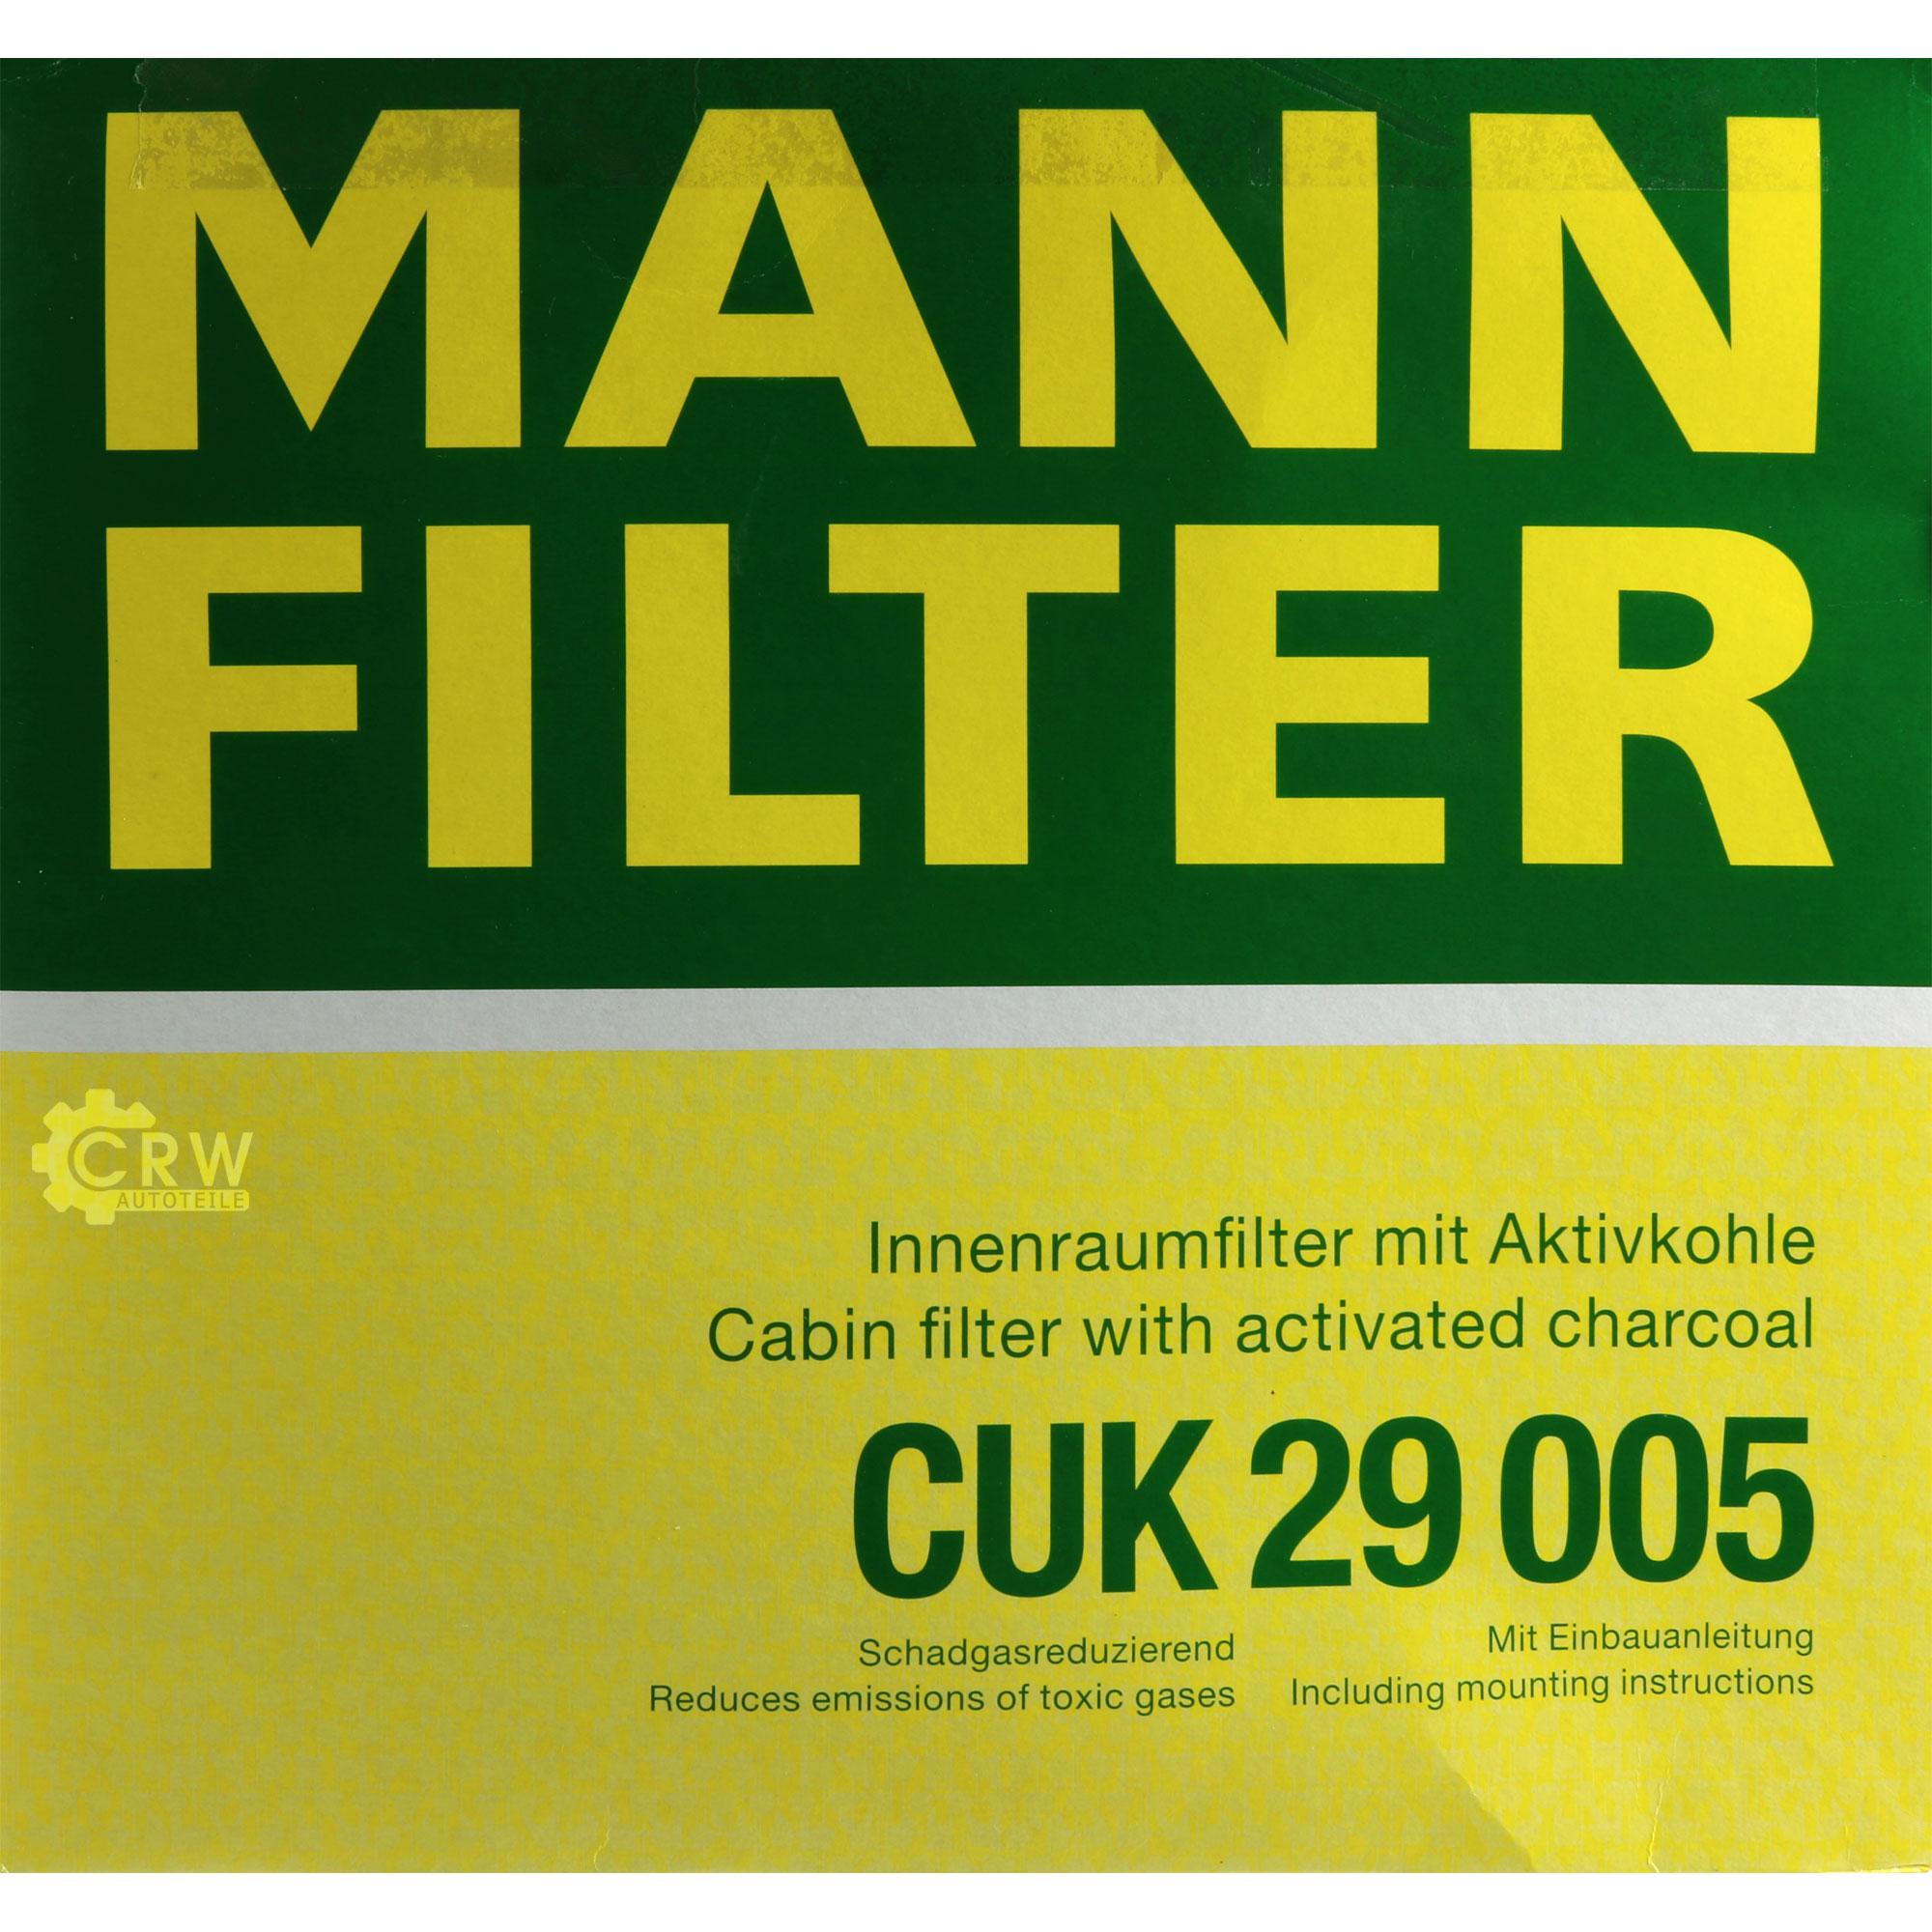 MANNOL-7-L-Energy-Premium-5W-30-MANN-FILTER-Mercedes-C-Klasse-W204-C-220-CDI Indexbild 6